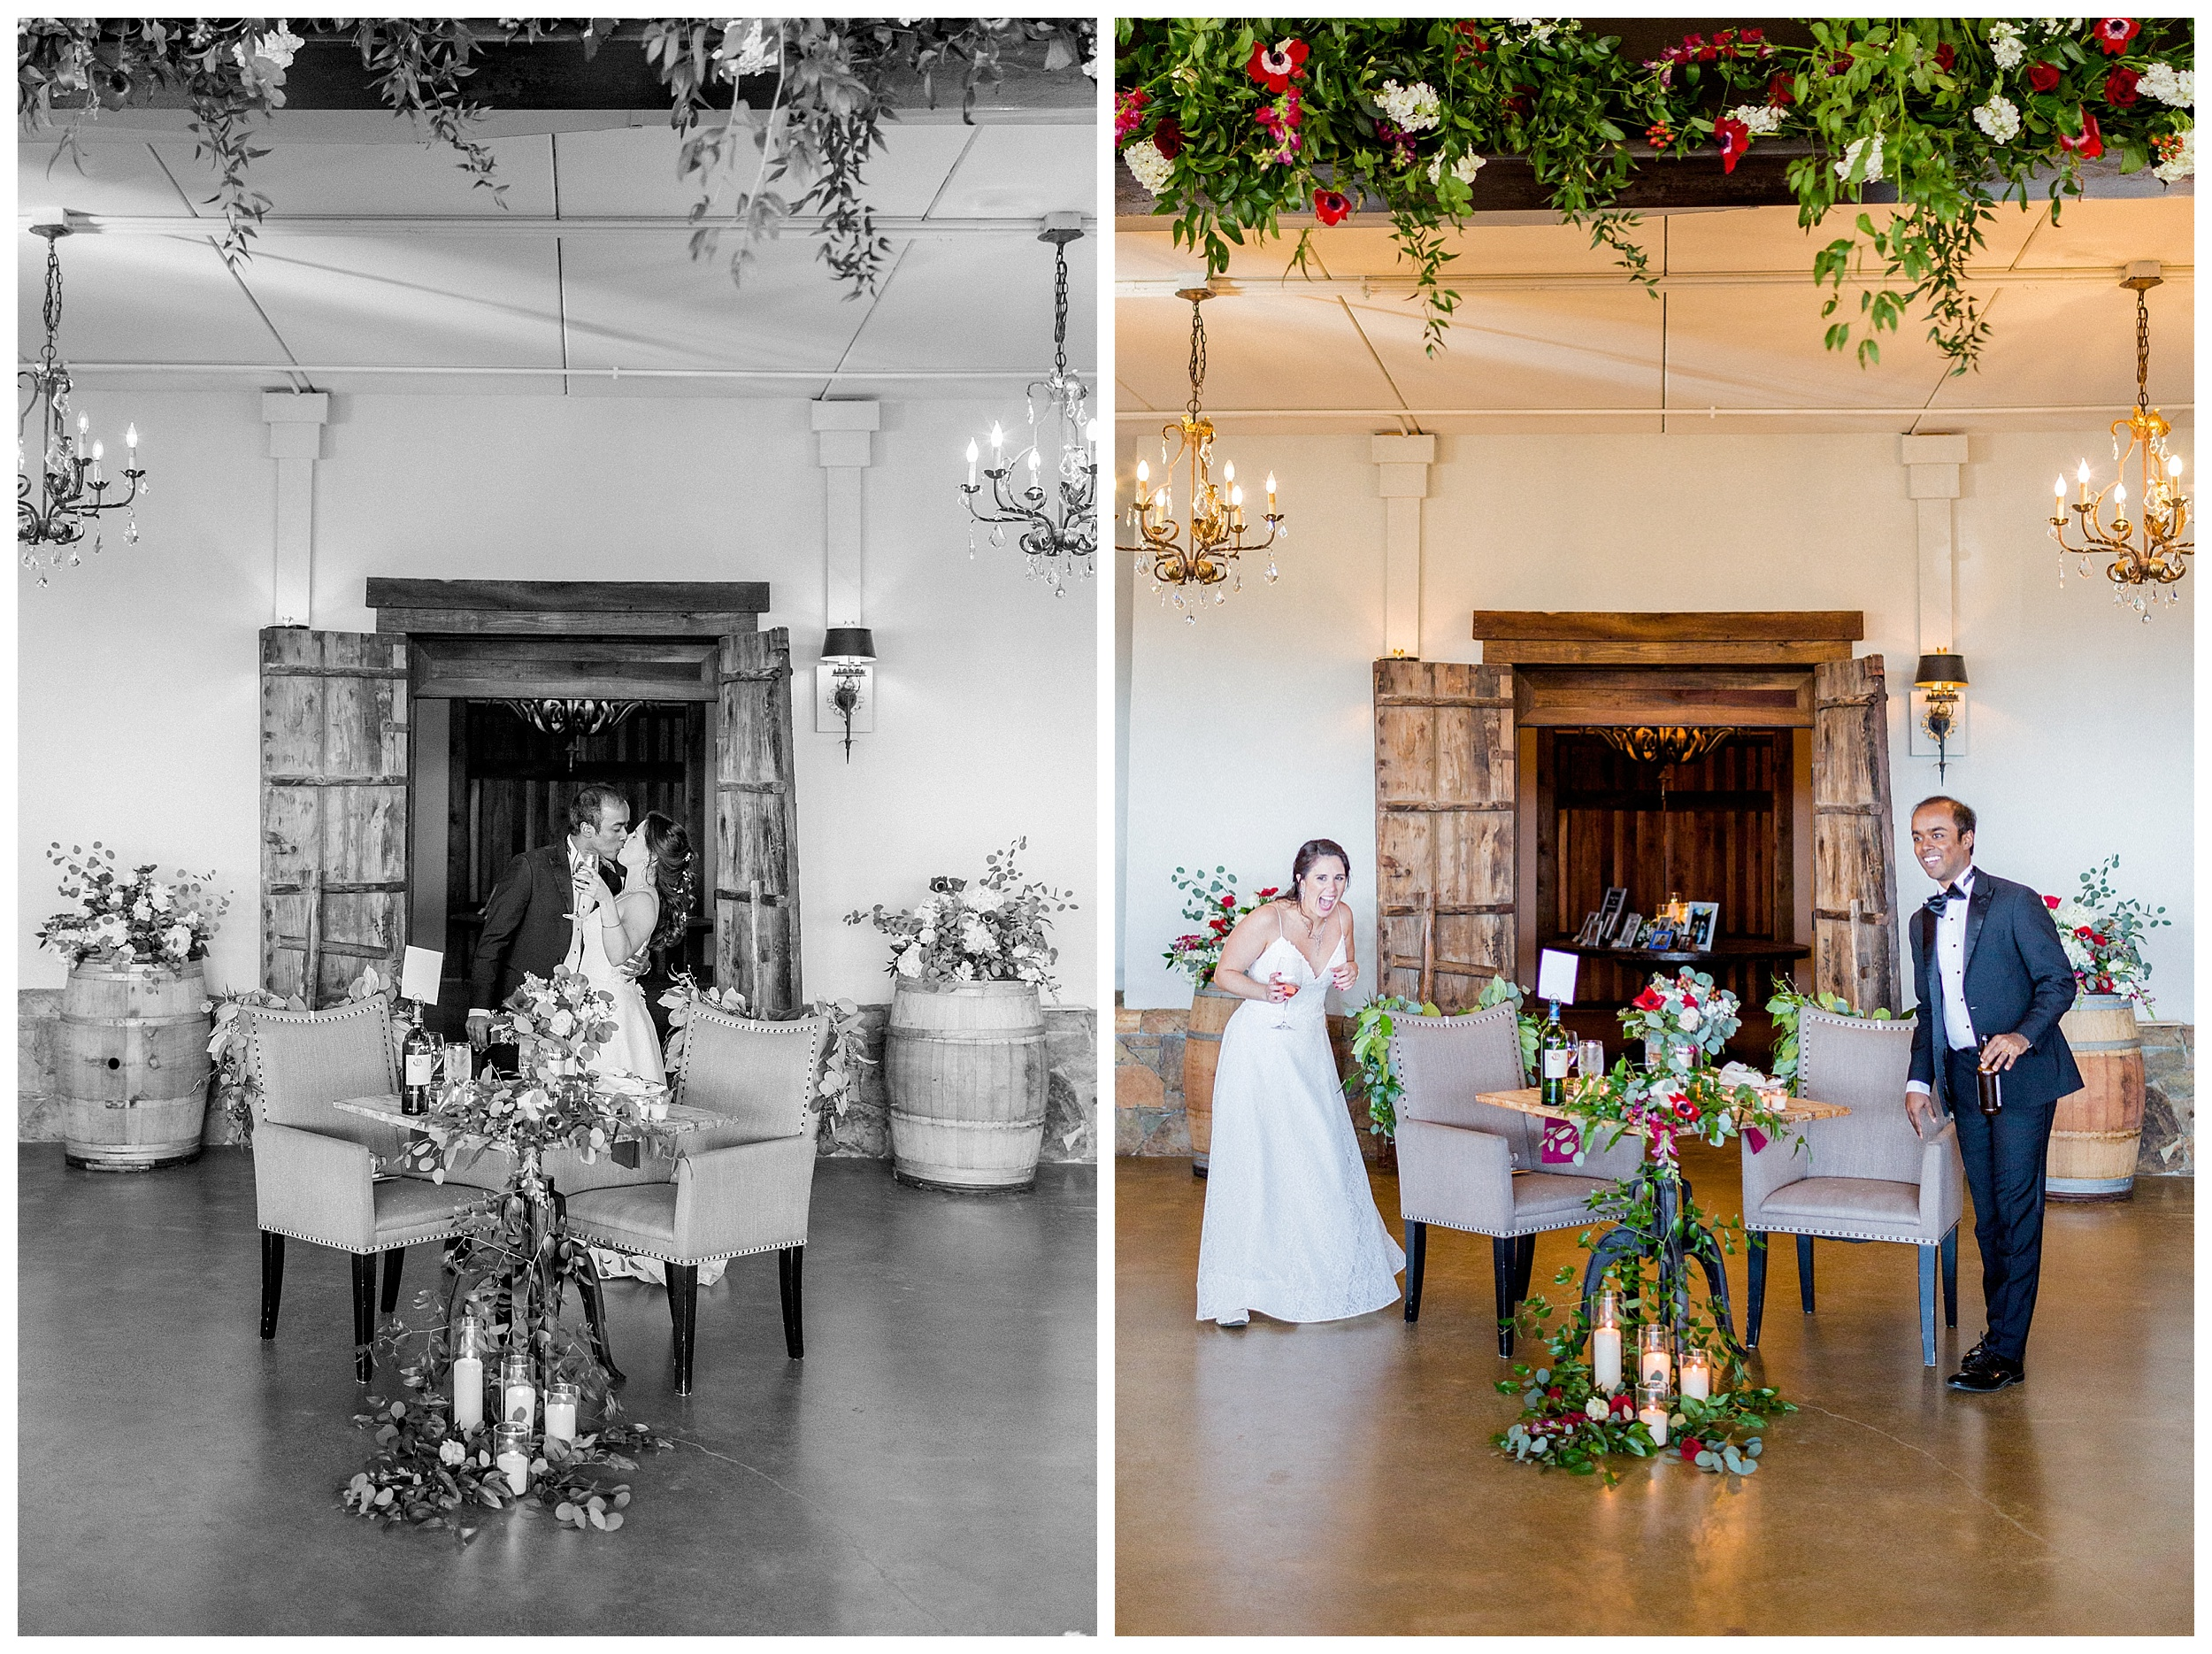 Stone Tower Winery Wedding | Virginia Winter Wedding | VA Wedding Photographer Kir Tuben_0091.jpg